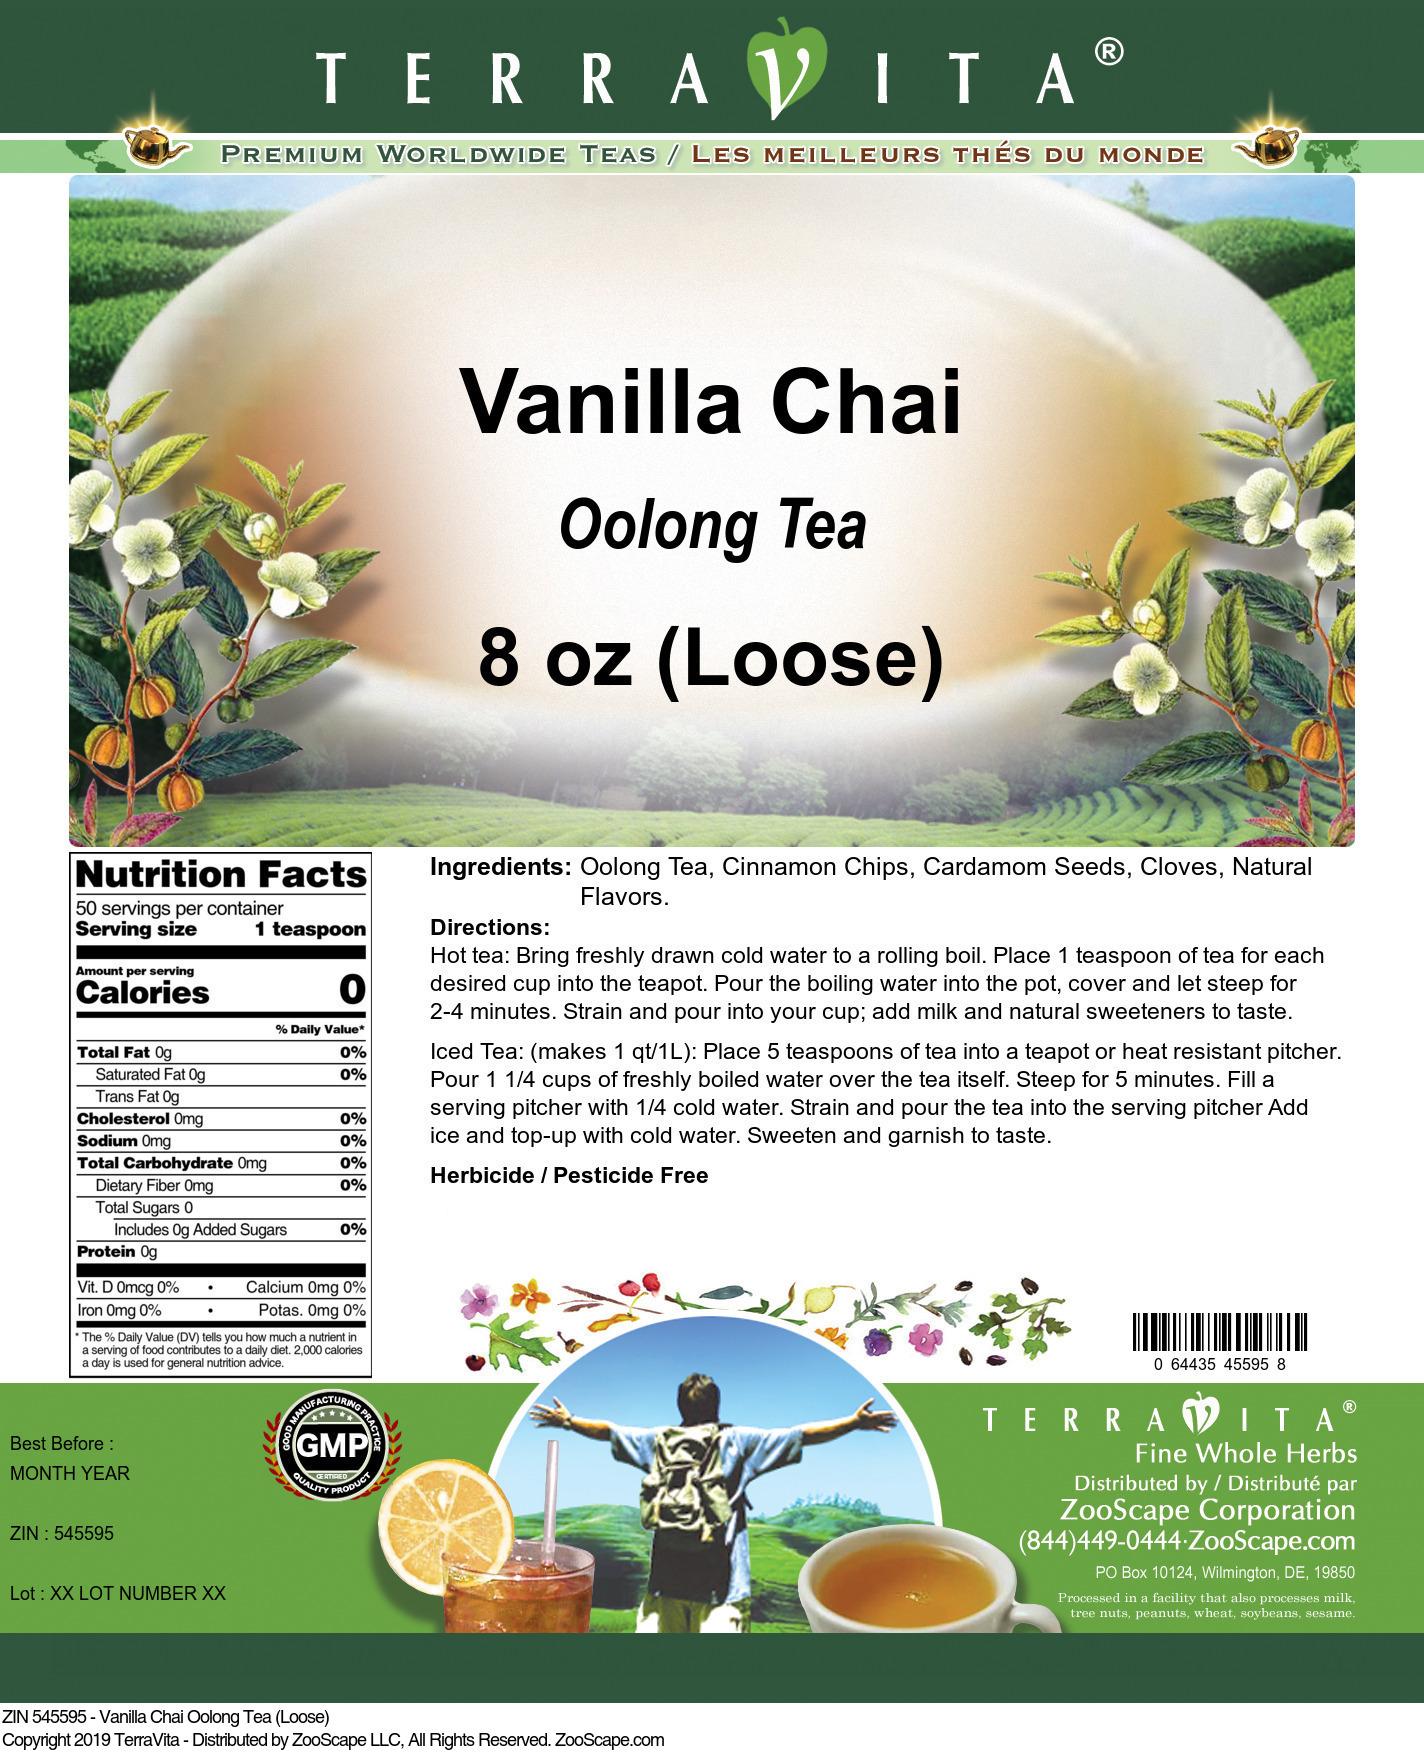 Vanilla Chai Oolong Tea